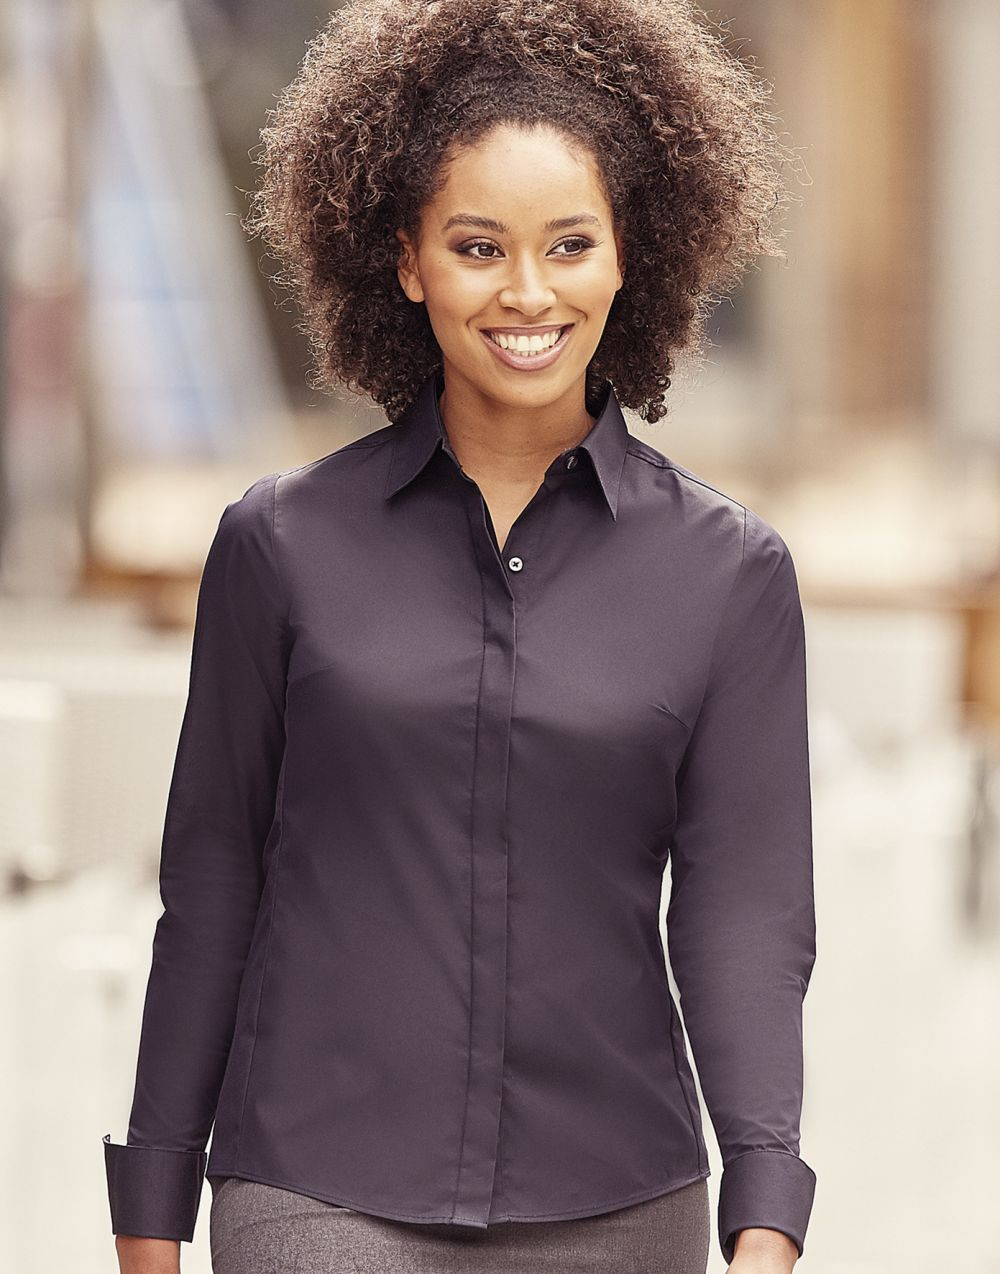 Camisas manga larga russell ajustada manga larga ultimate mujer con publicidad vista 6